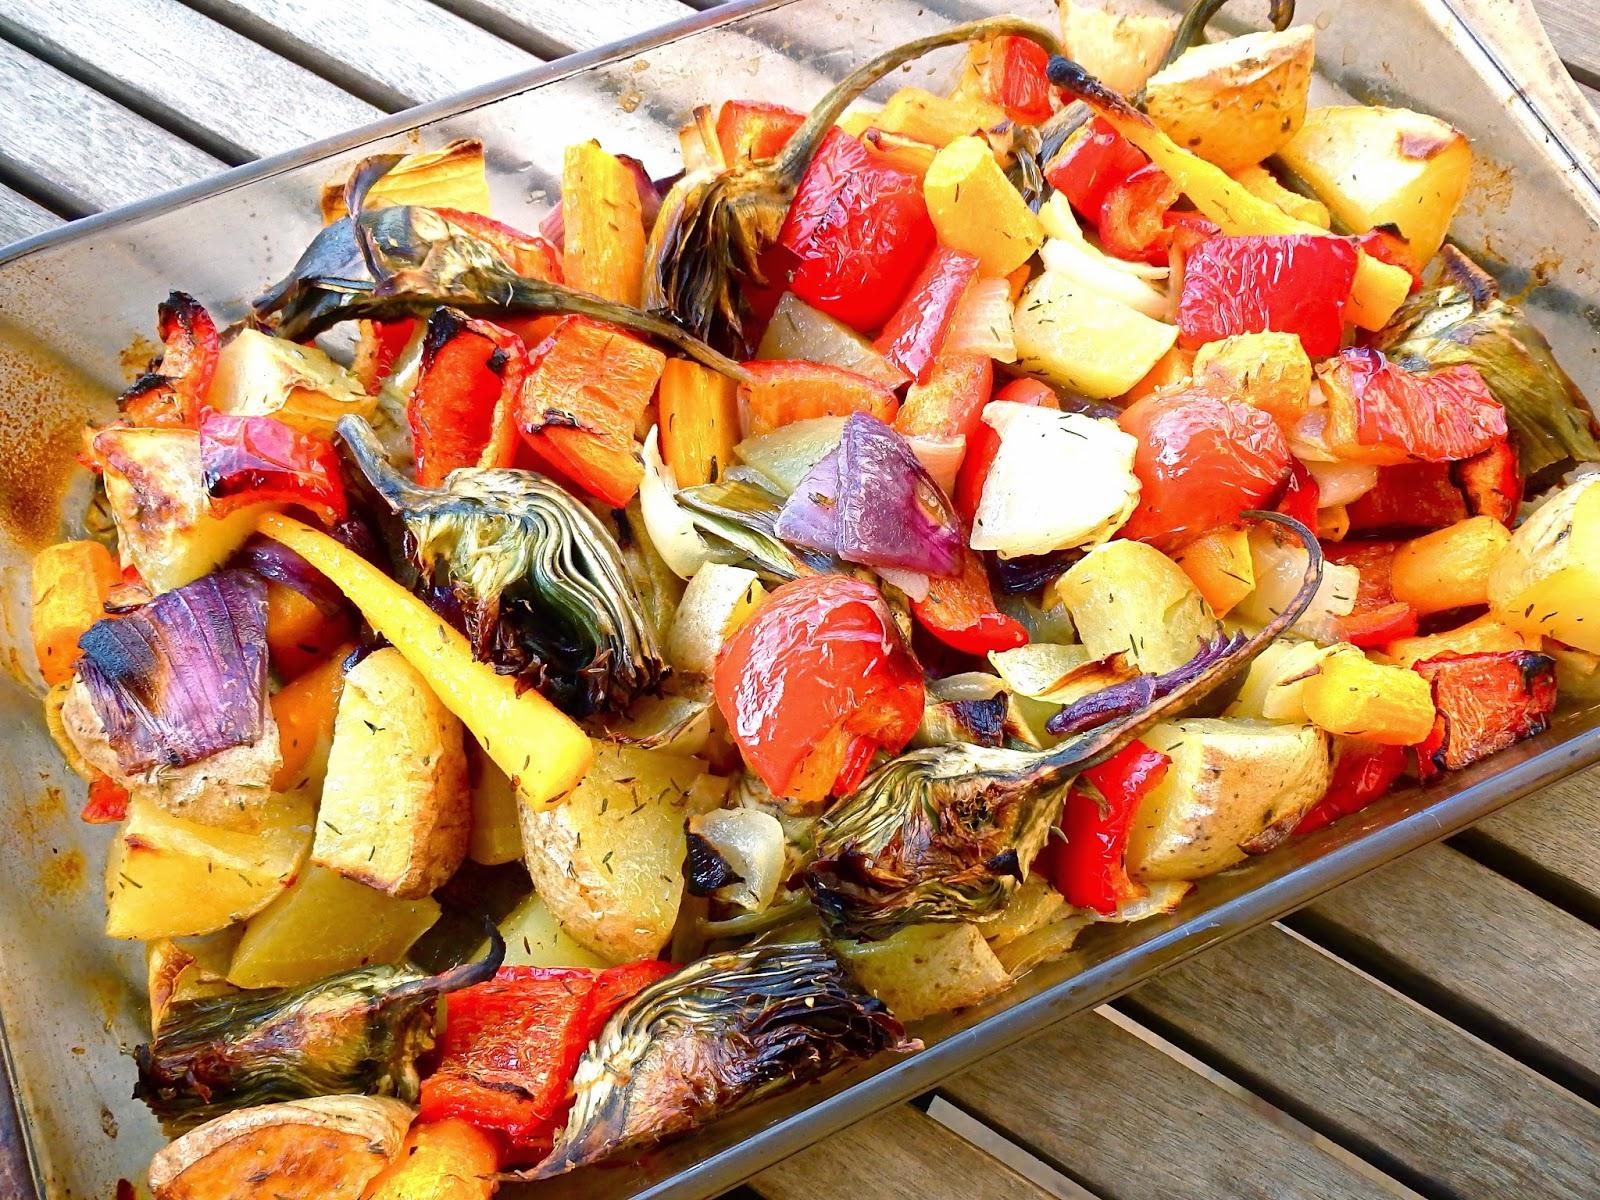 Verduras al horno receta light - Salsa para verduras al horno ...